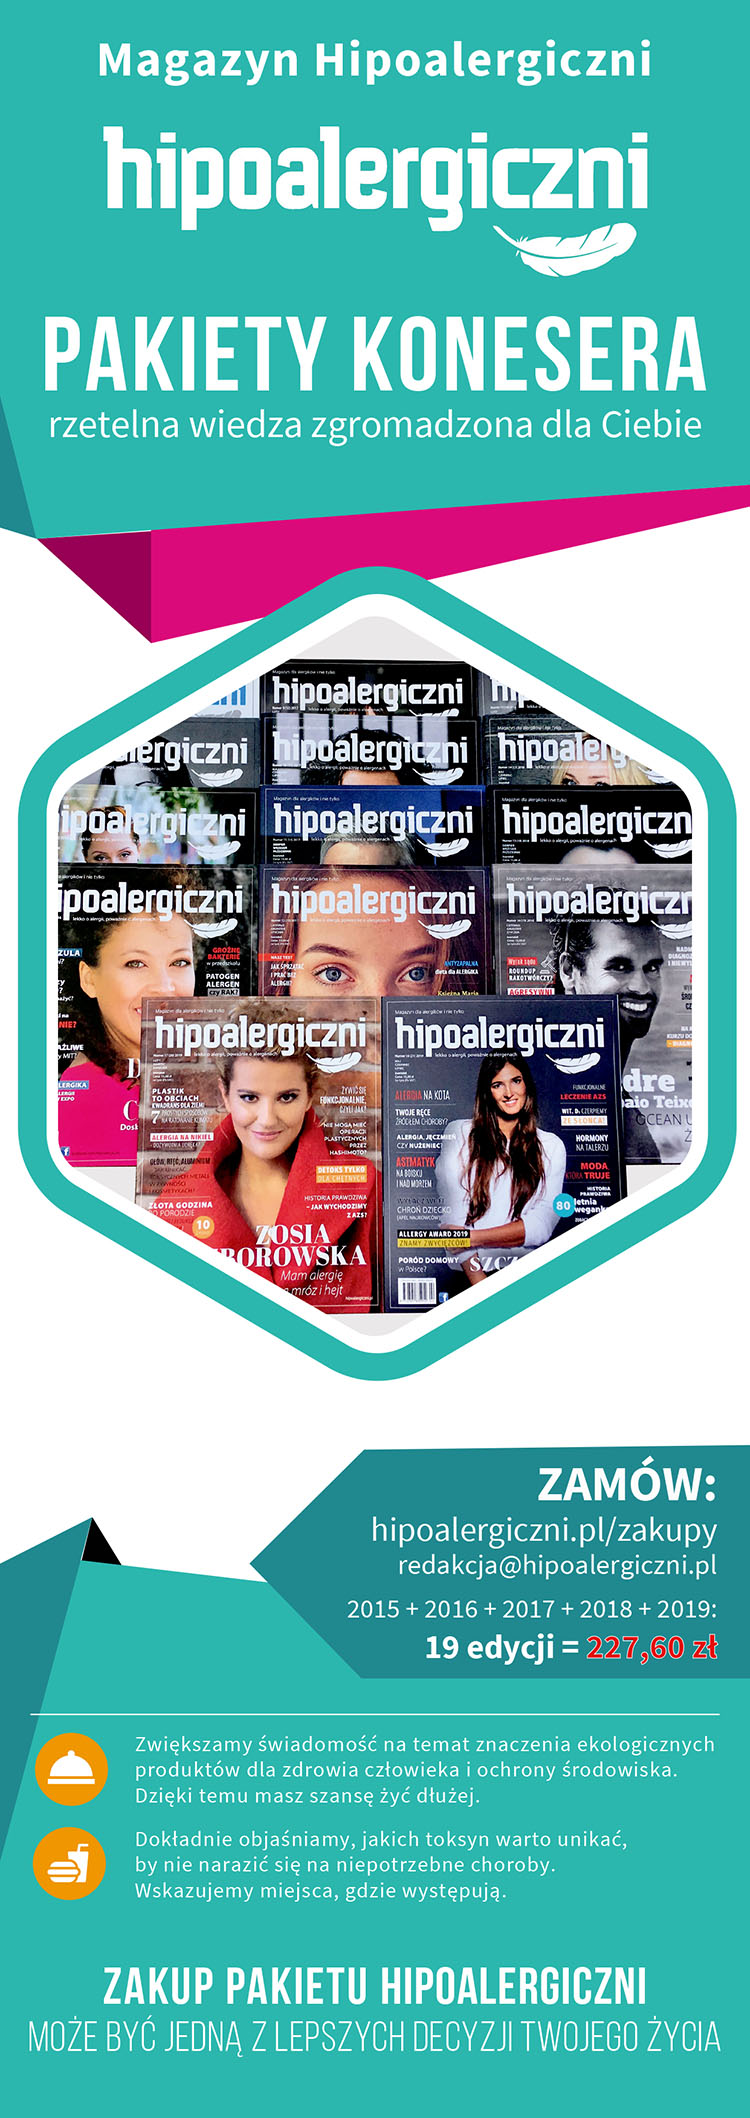 Hipoalergiczni - pakiety konesera